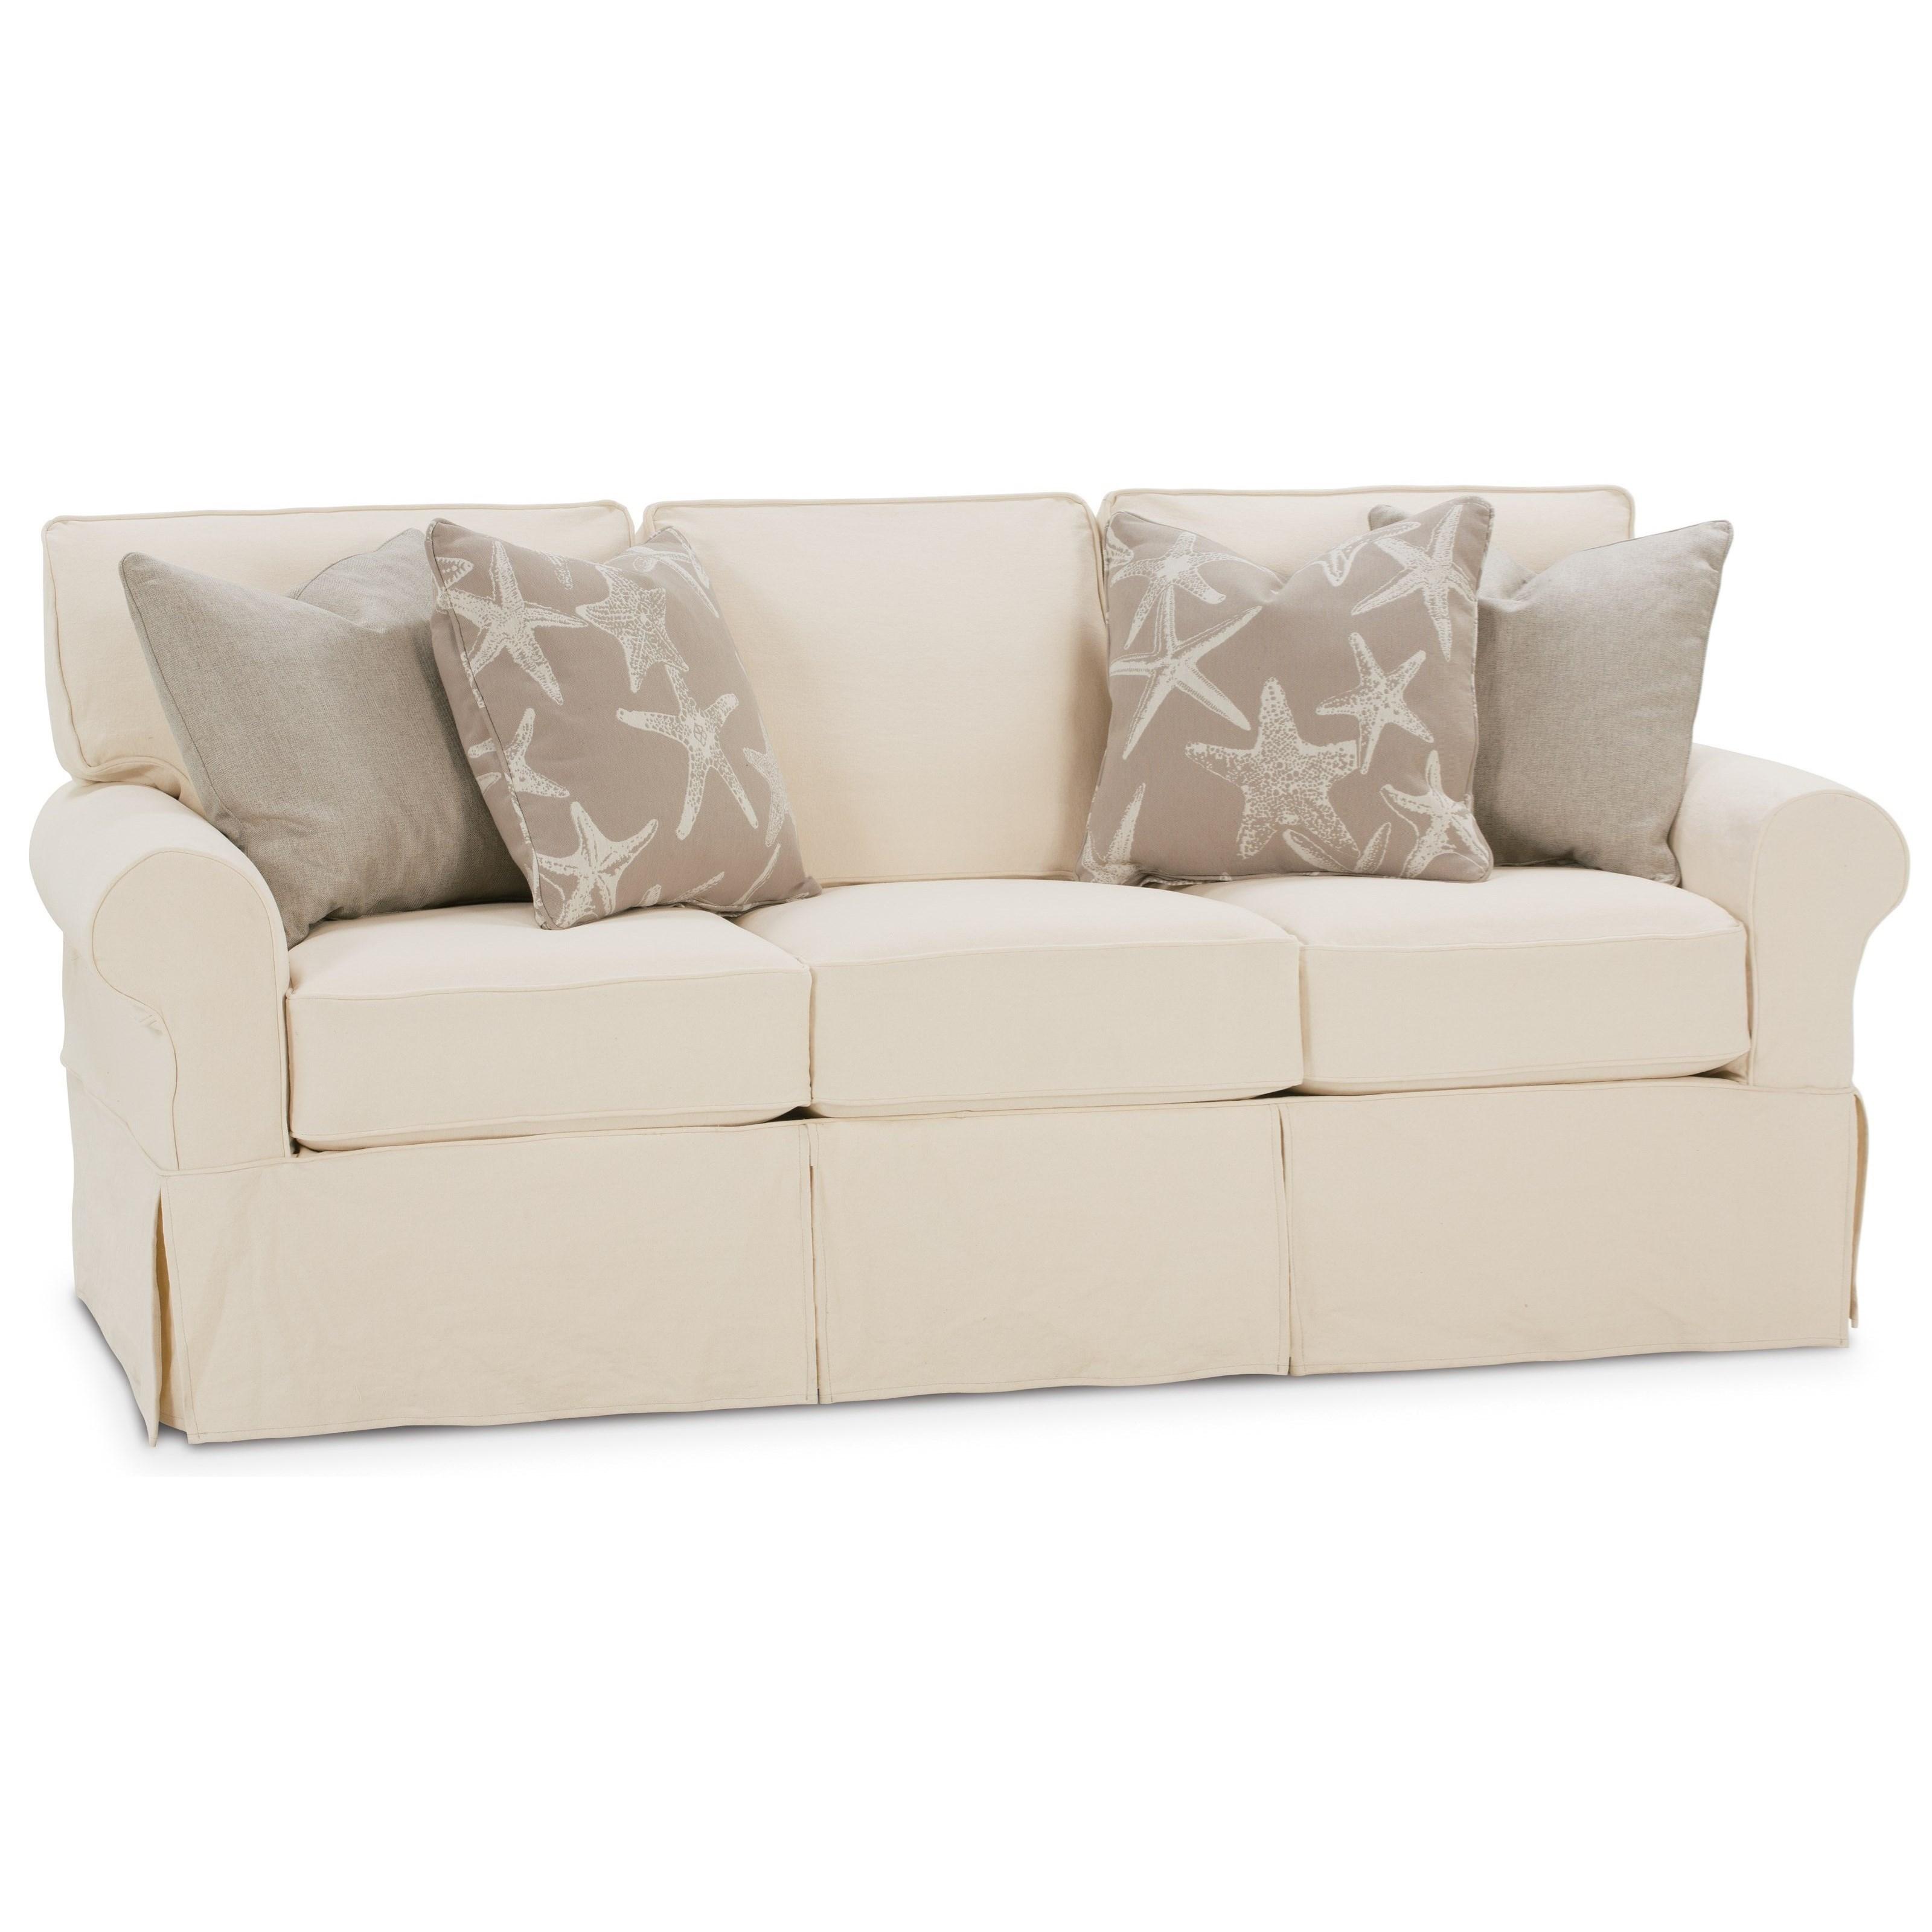 Rowe Nantucket 84 Quot 3 Cushion Slipcover Sofa Belfort